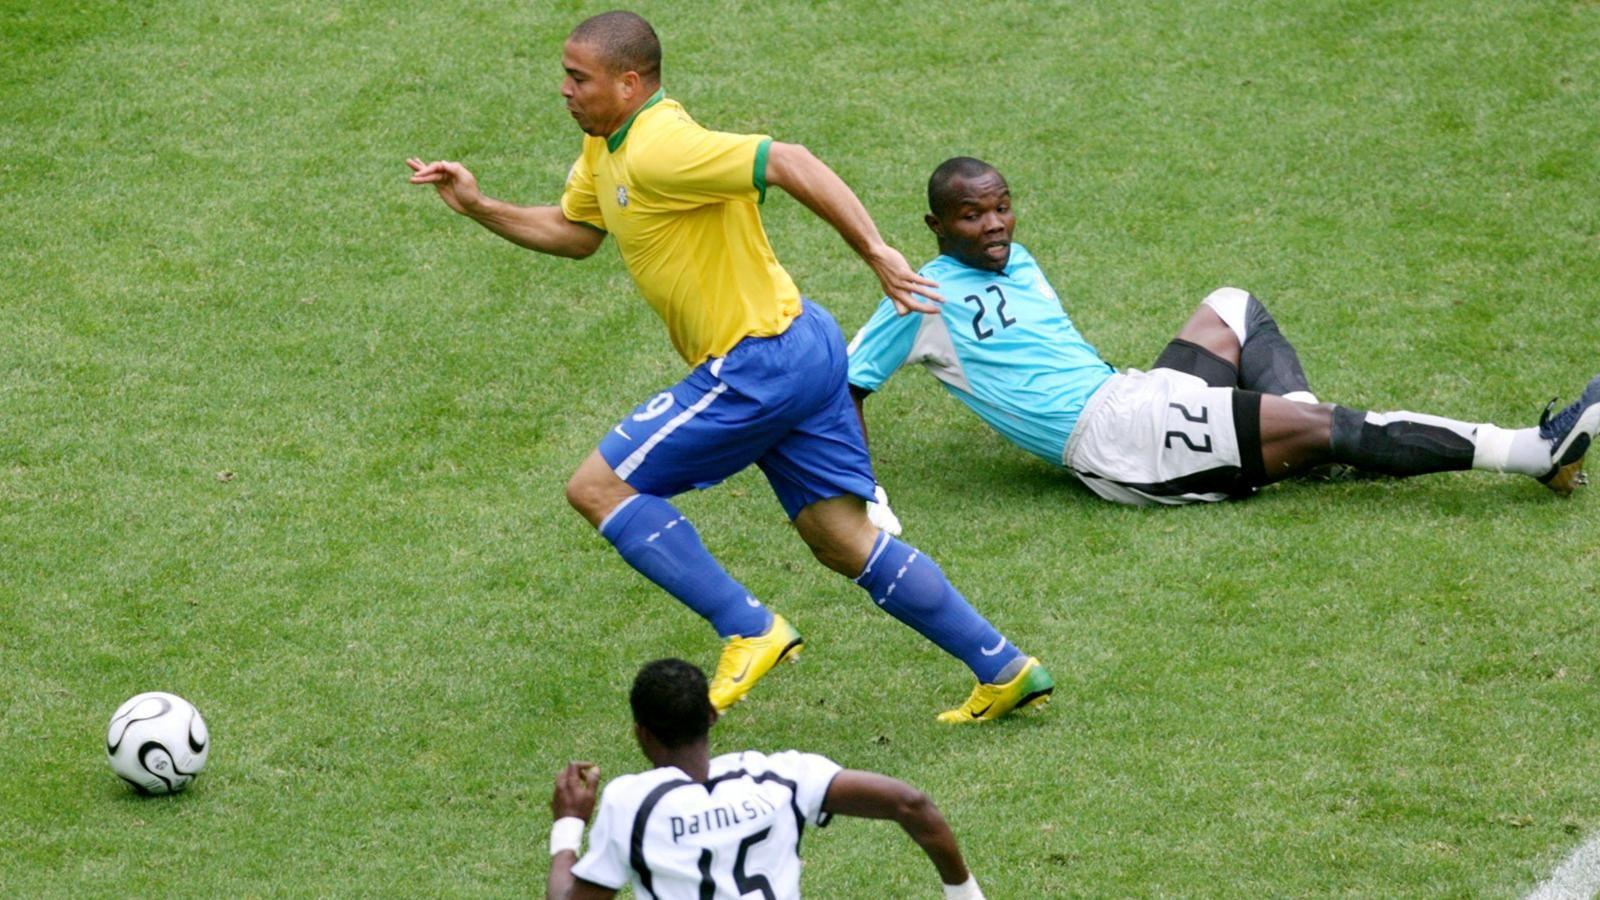 Ronaldo-WC-2006-Nike-Mercurial-Vapor-juin-2018